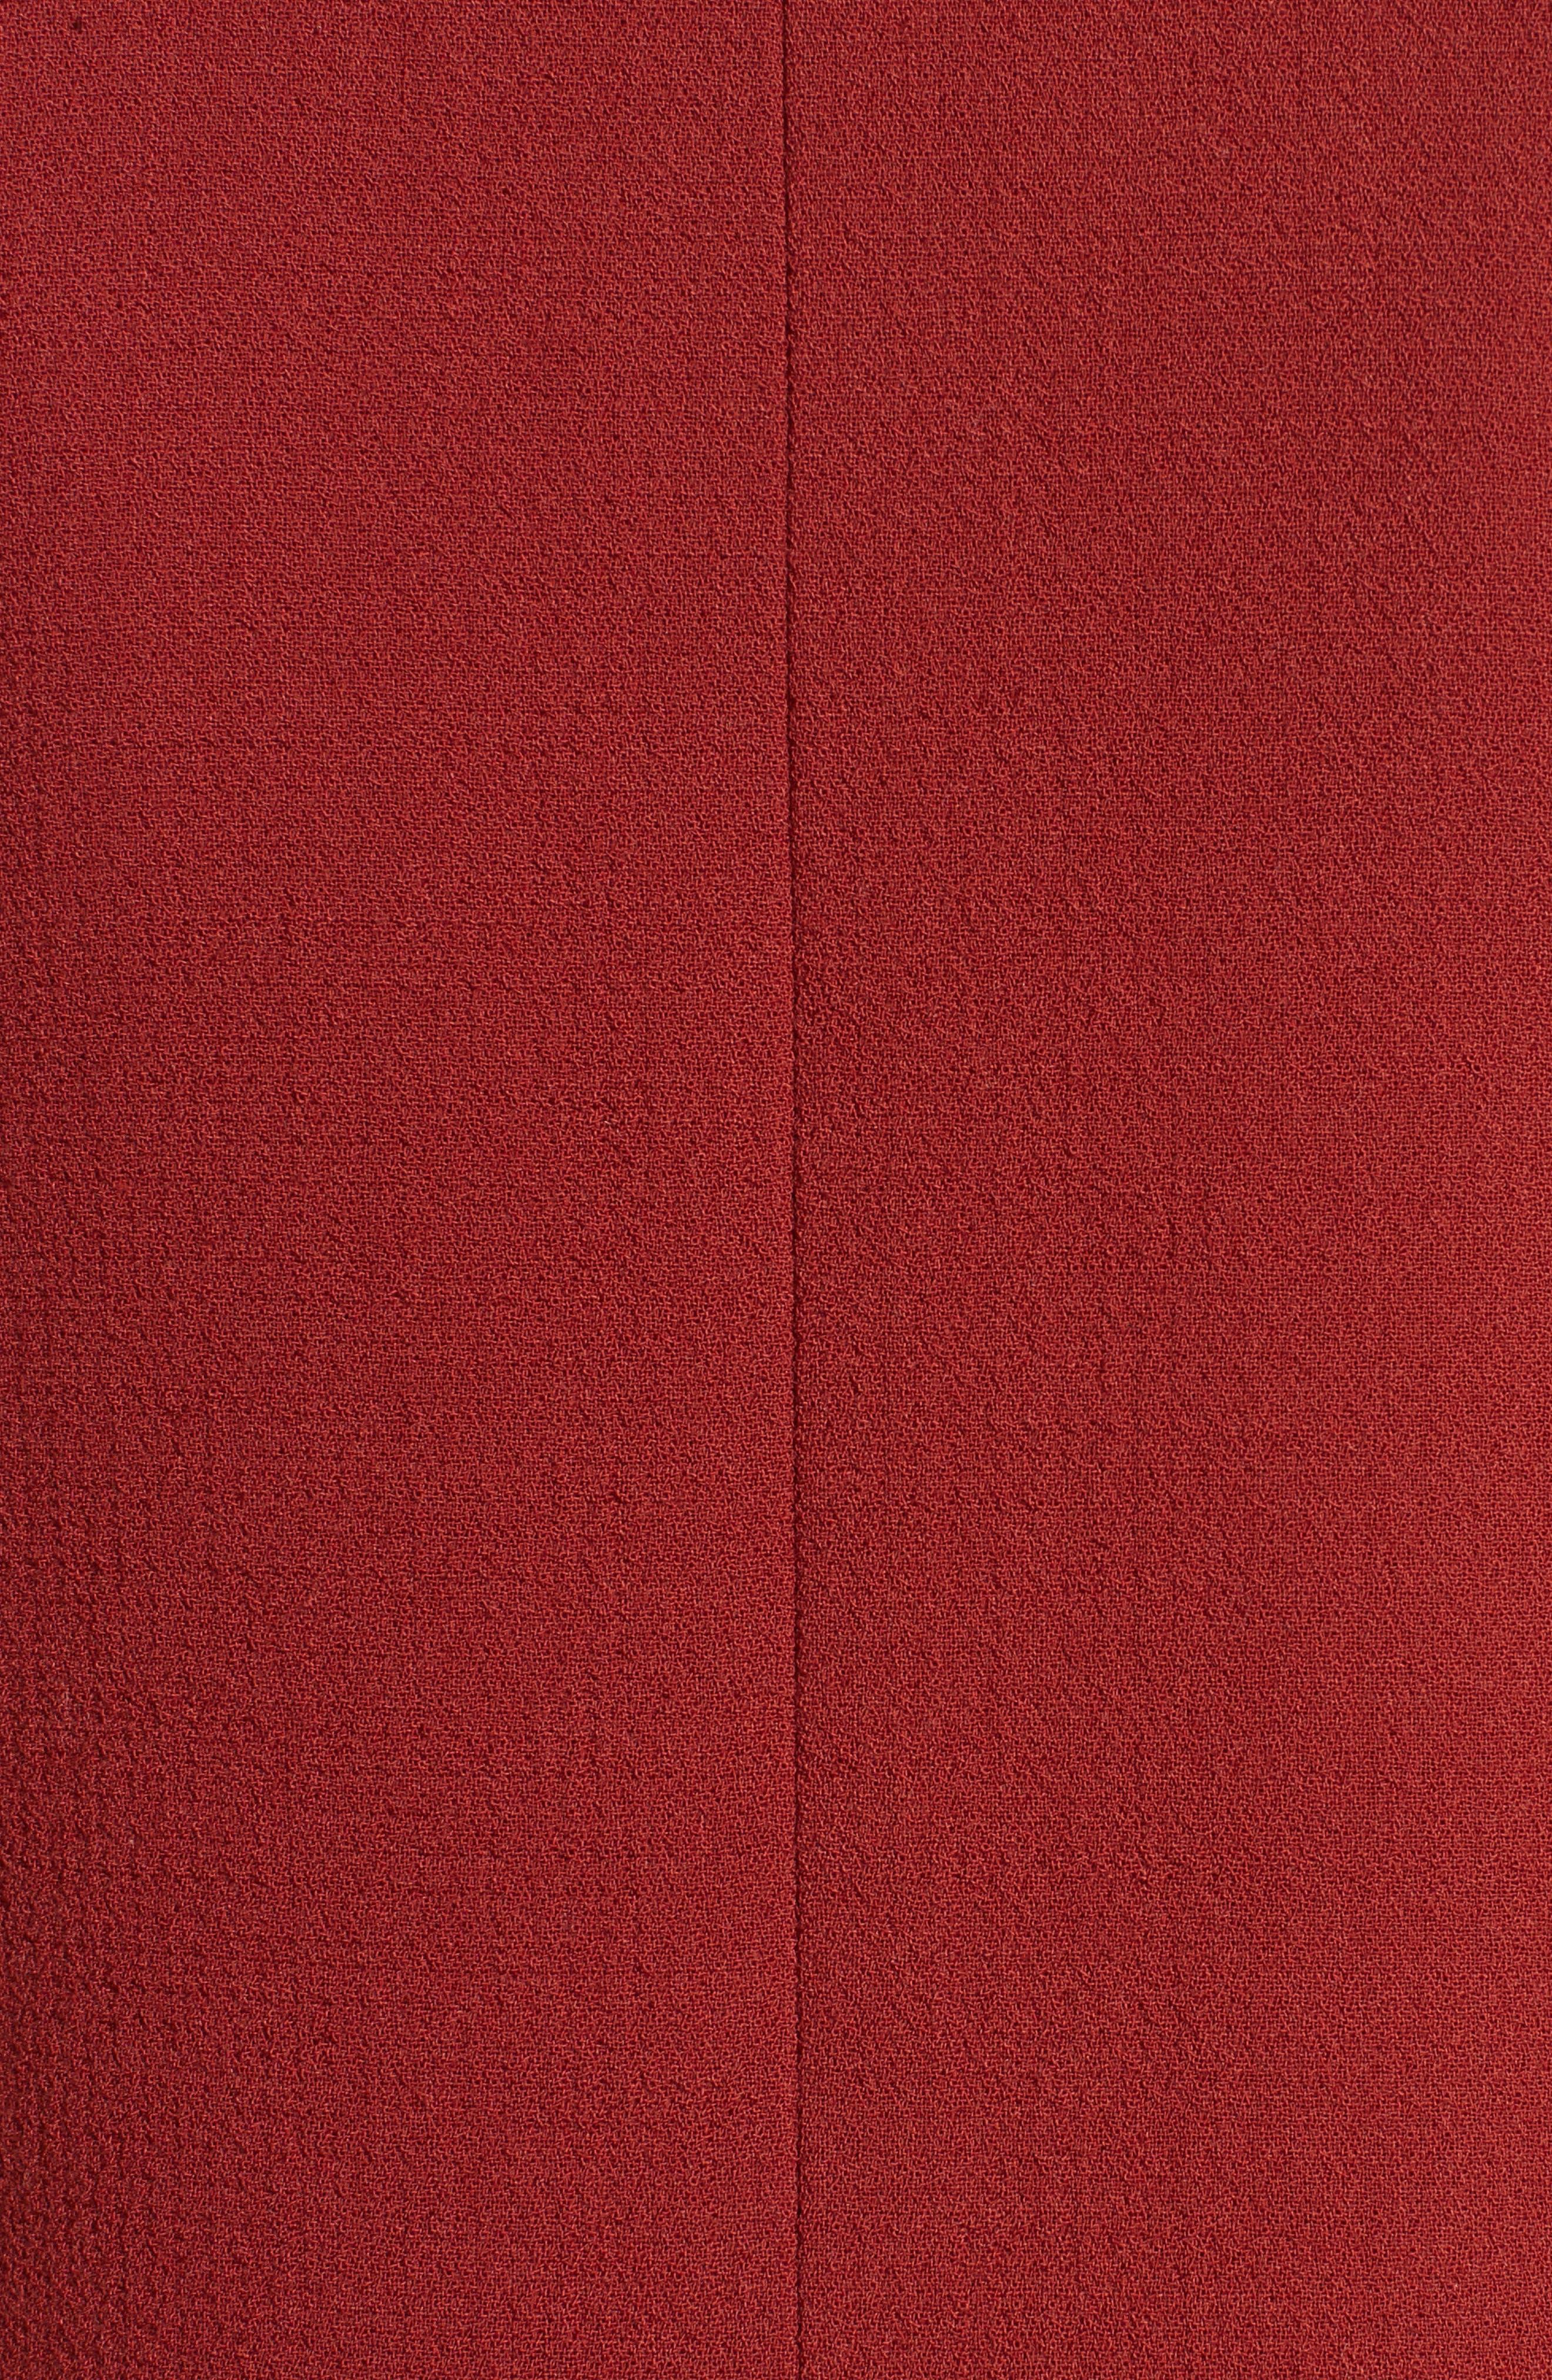 Alternate Image 2  - Chloé Wool Crepe Jumper Dress